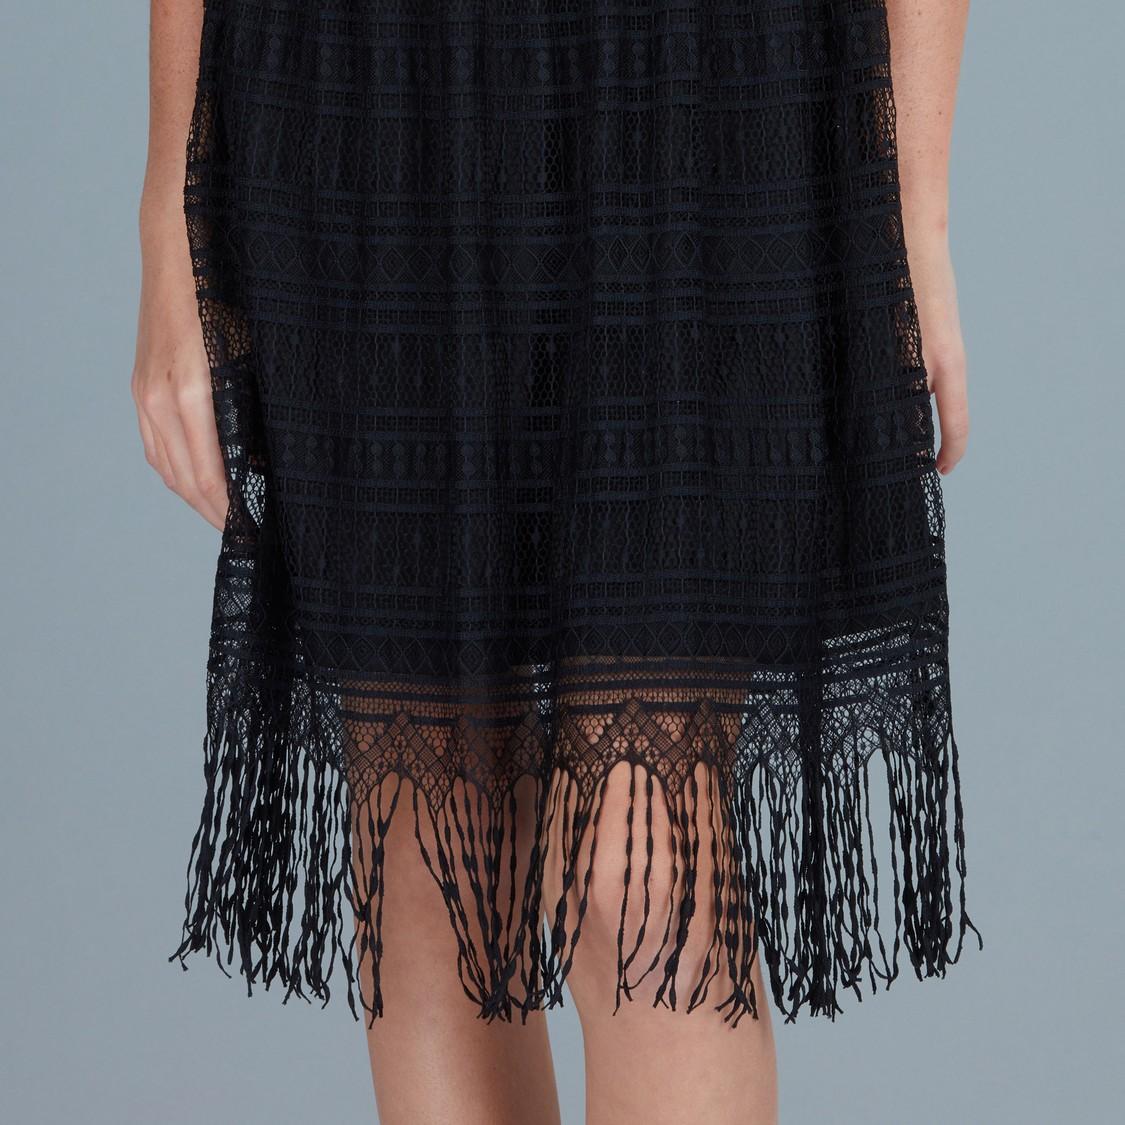 فستان دون أكمام بتفاصيل دانتيل